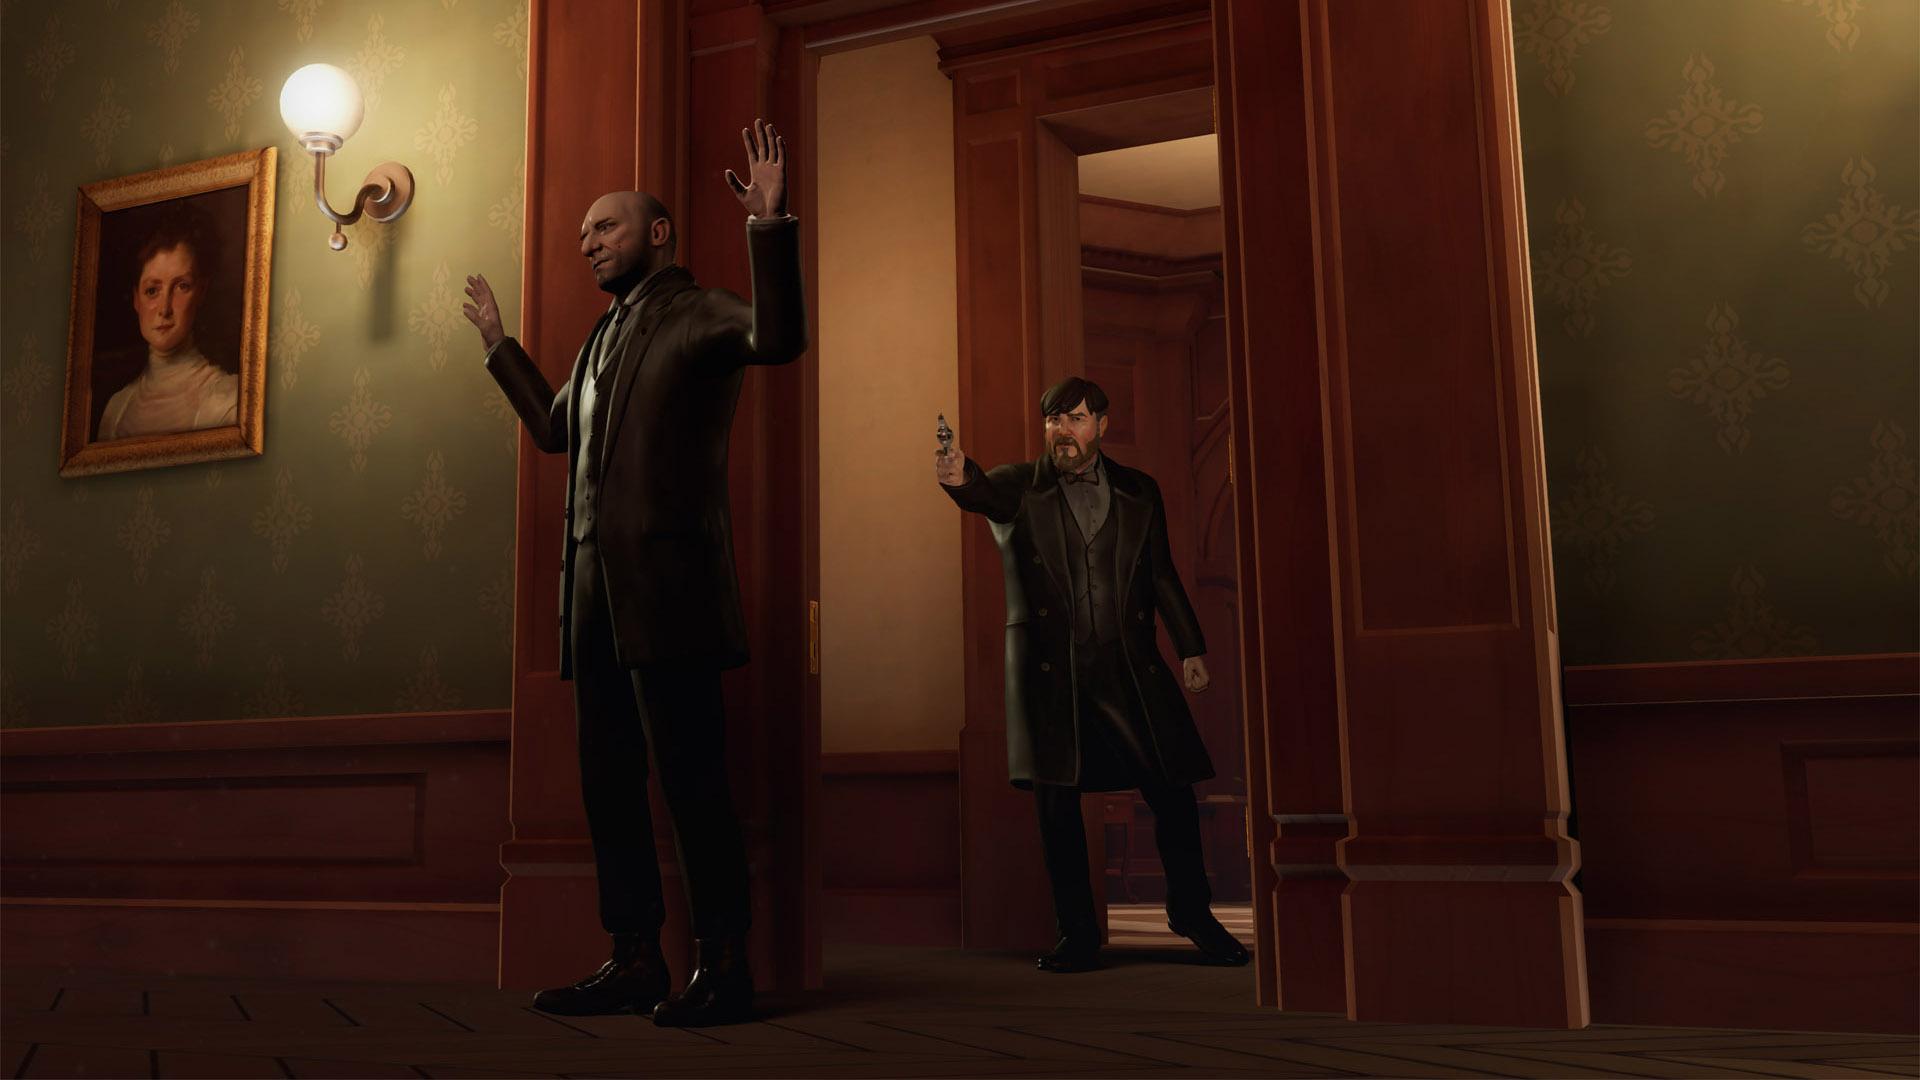 Разработчики Rime перенесли выход своей VR-адвенчуры The Invisible Hours